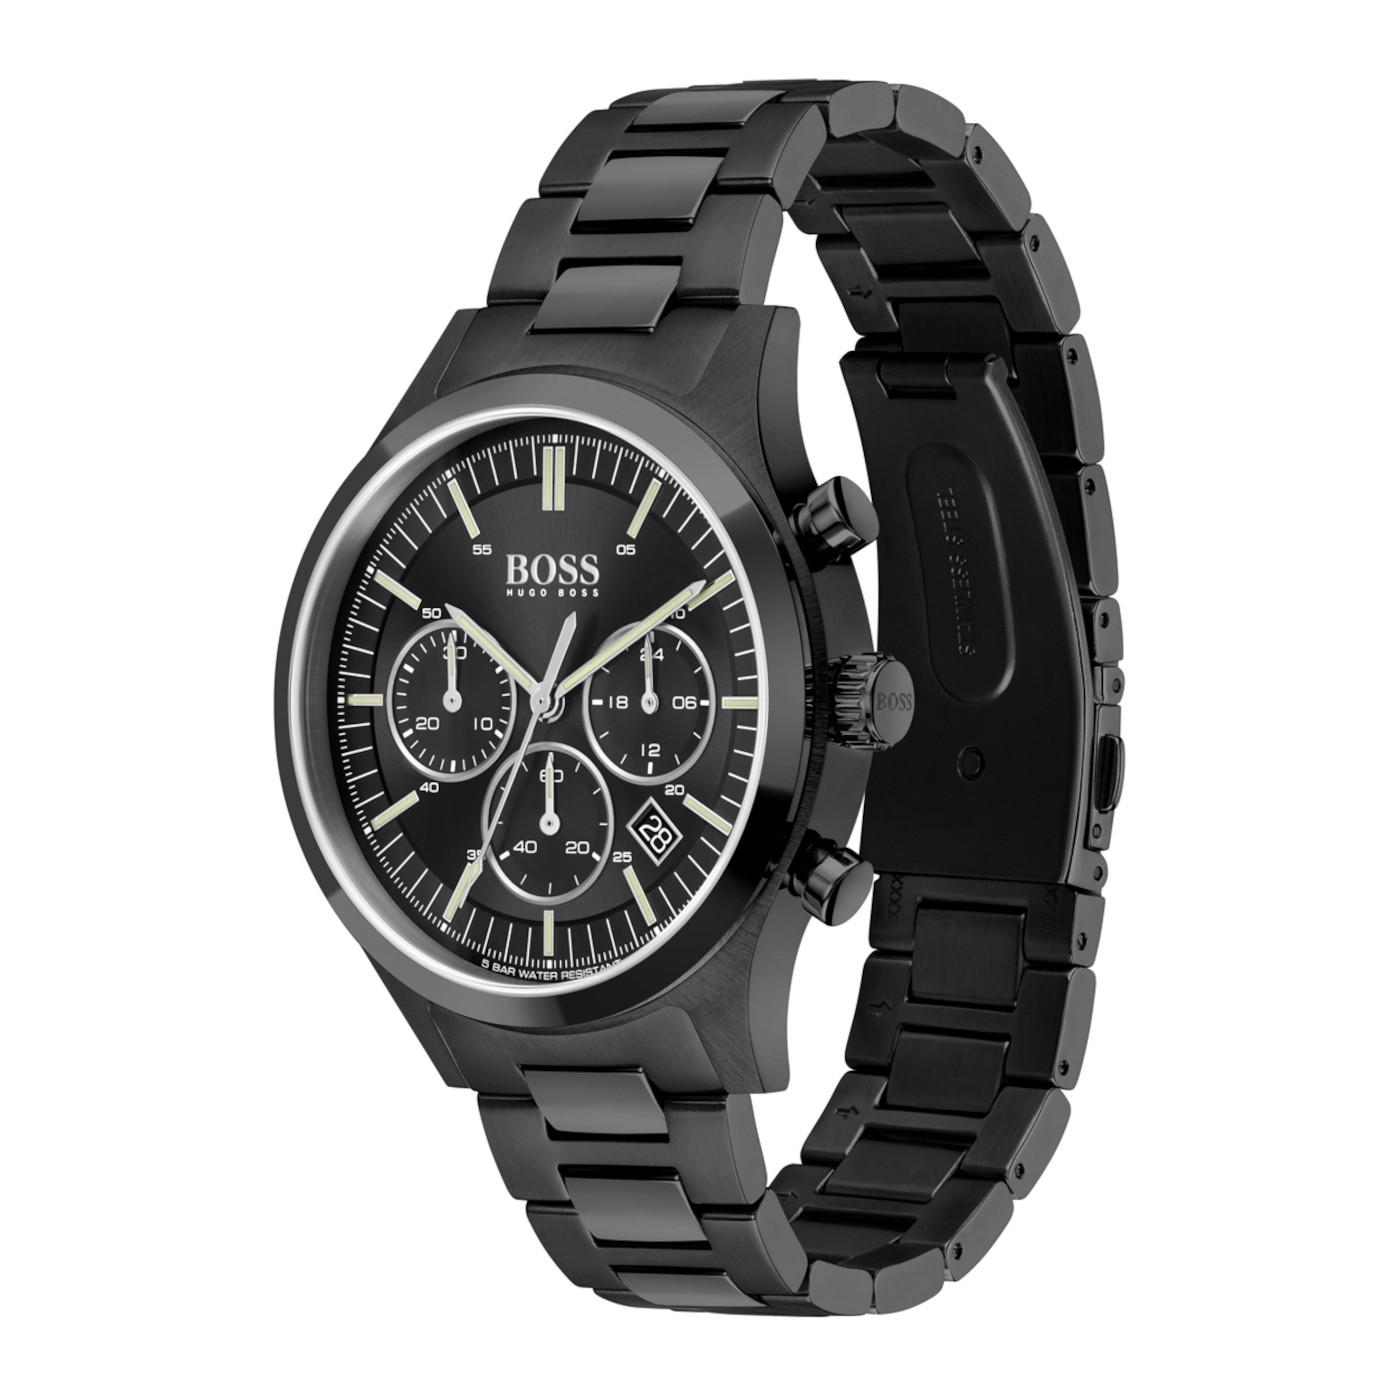 BOSS Metronome Chronograaf horloge HB1513802